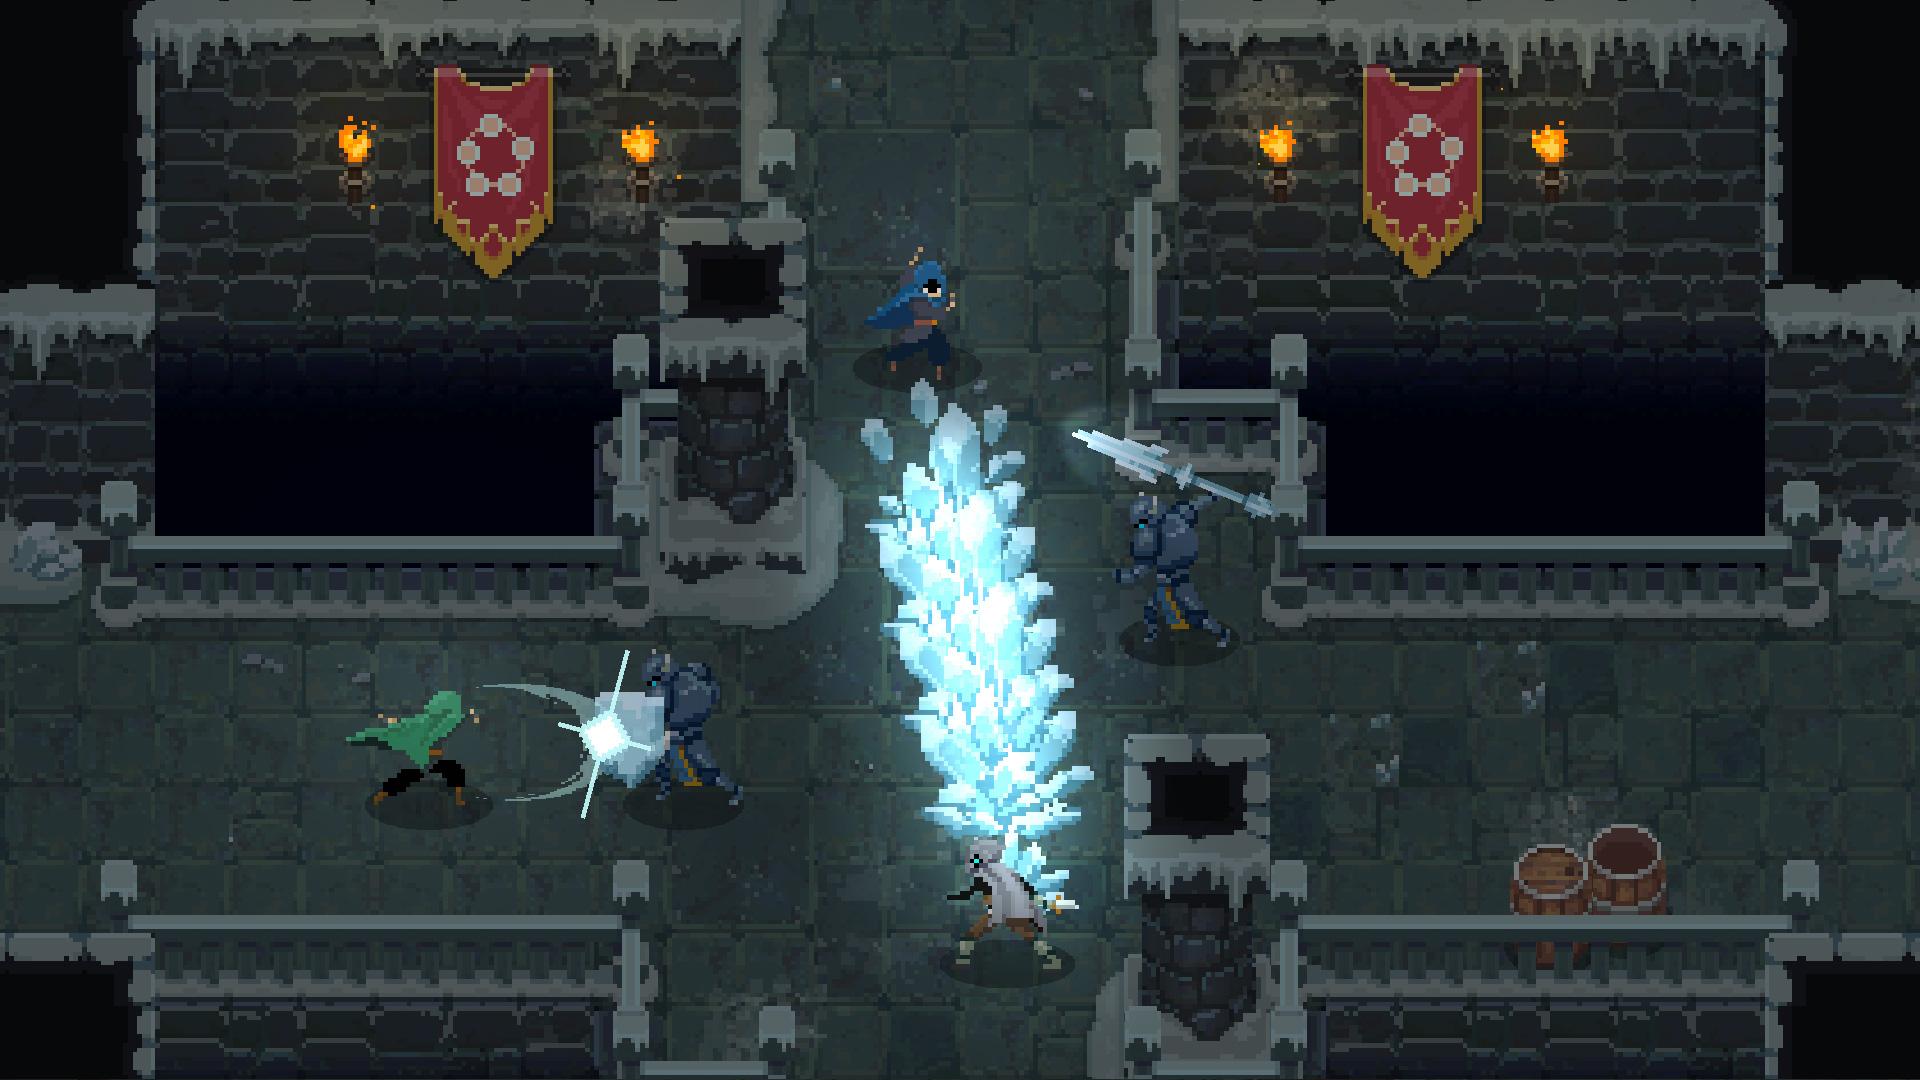 wizard-of-legend-pc-screenshot-2